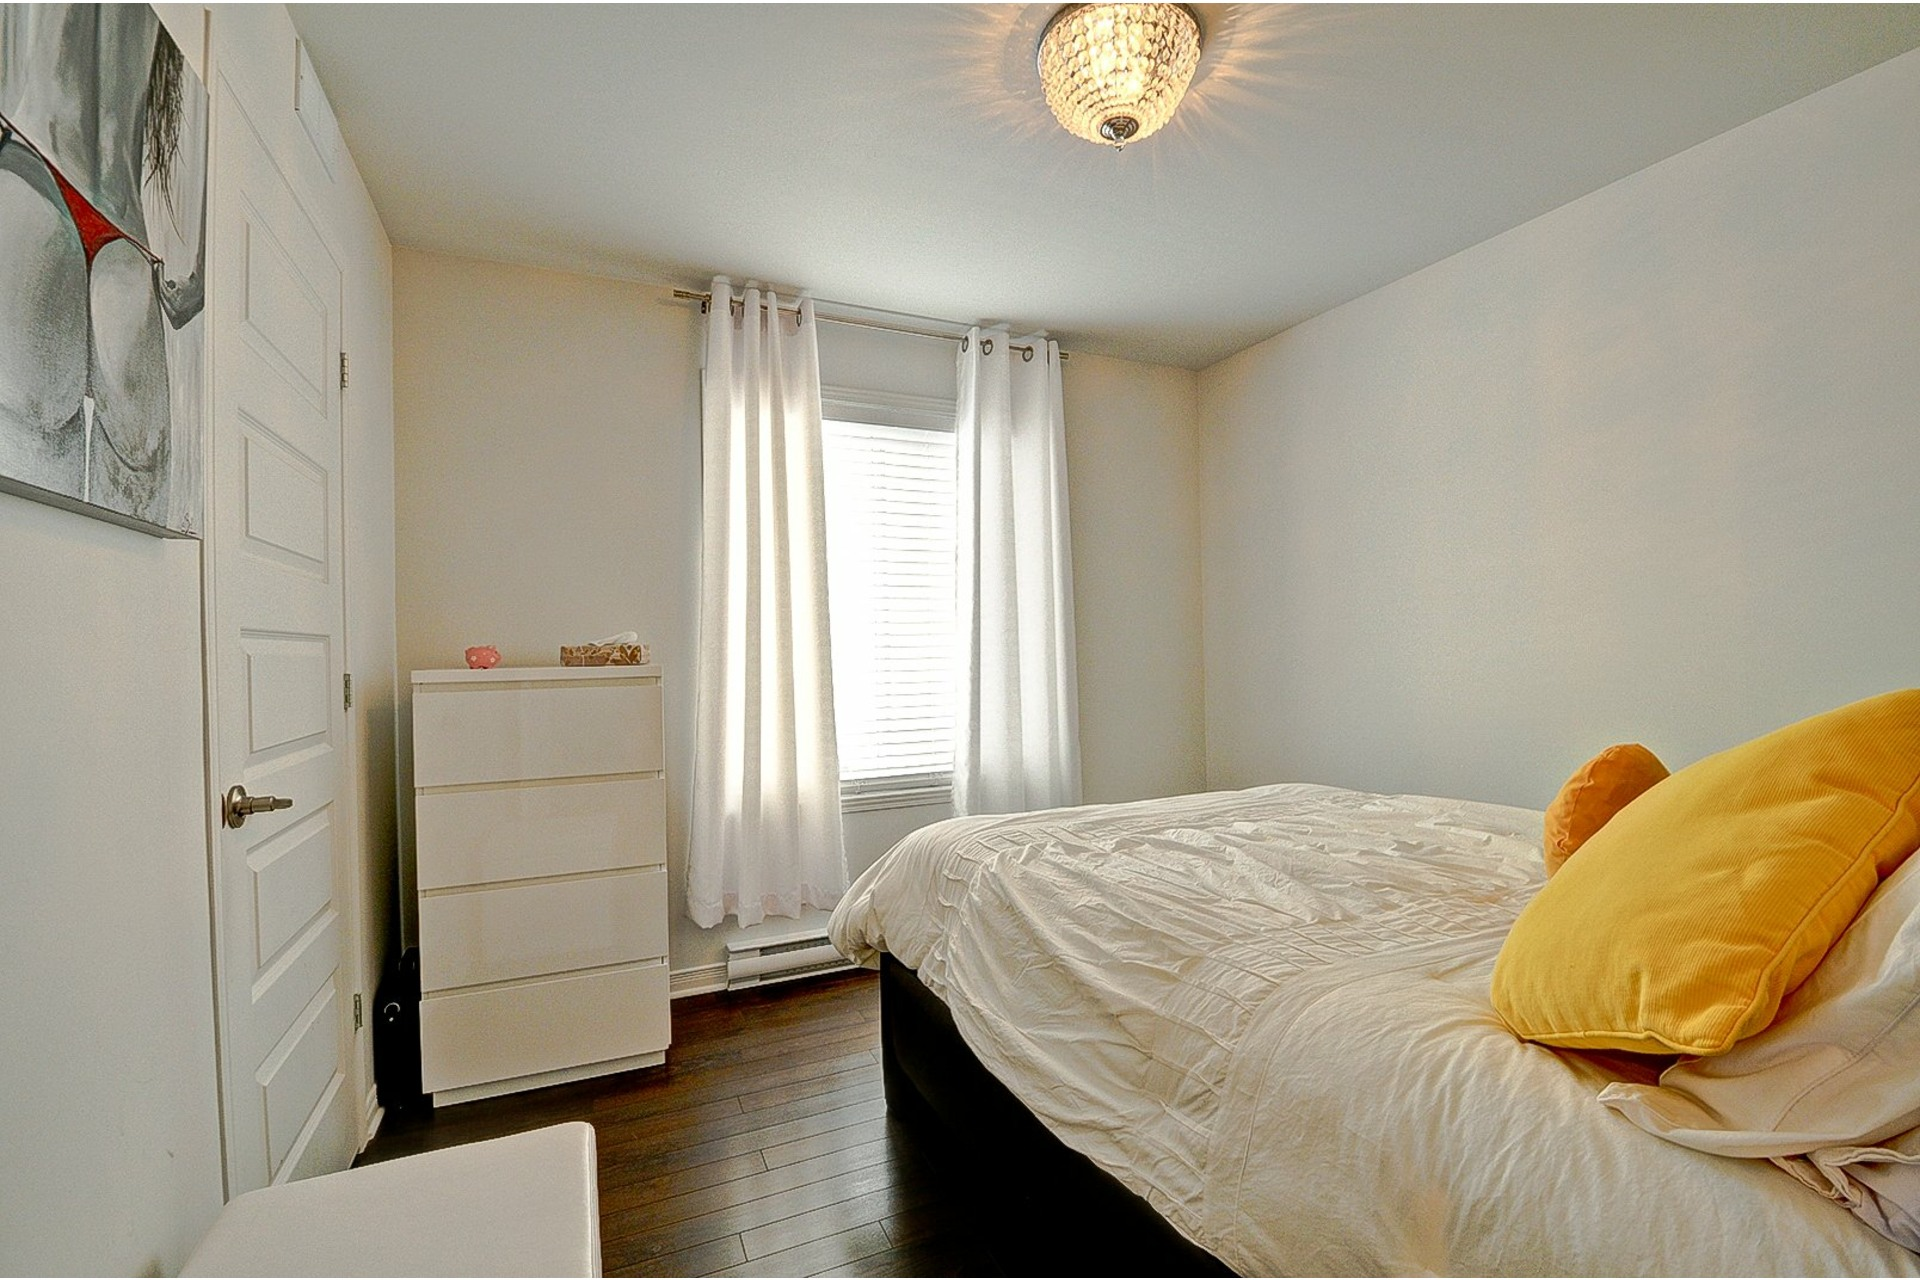 image 13 - Apartment For sale Vaudreuil-Dorion - 7 rooms